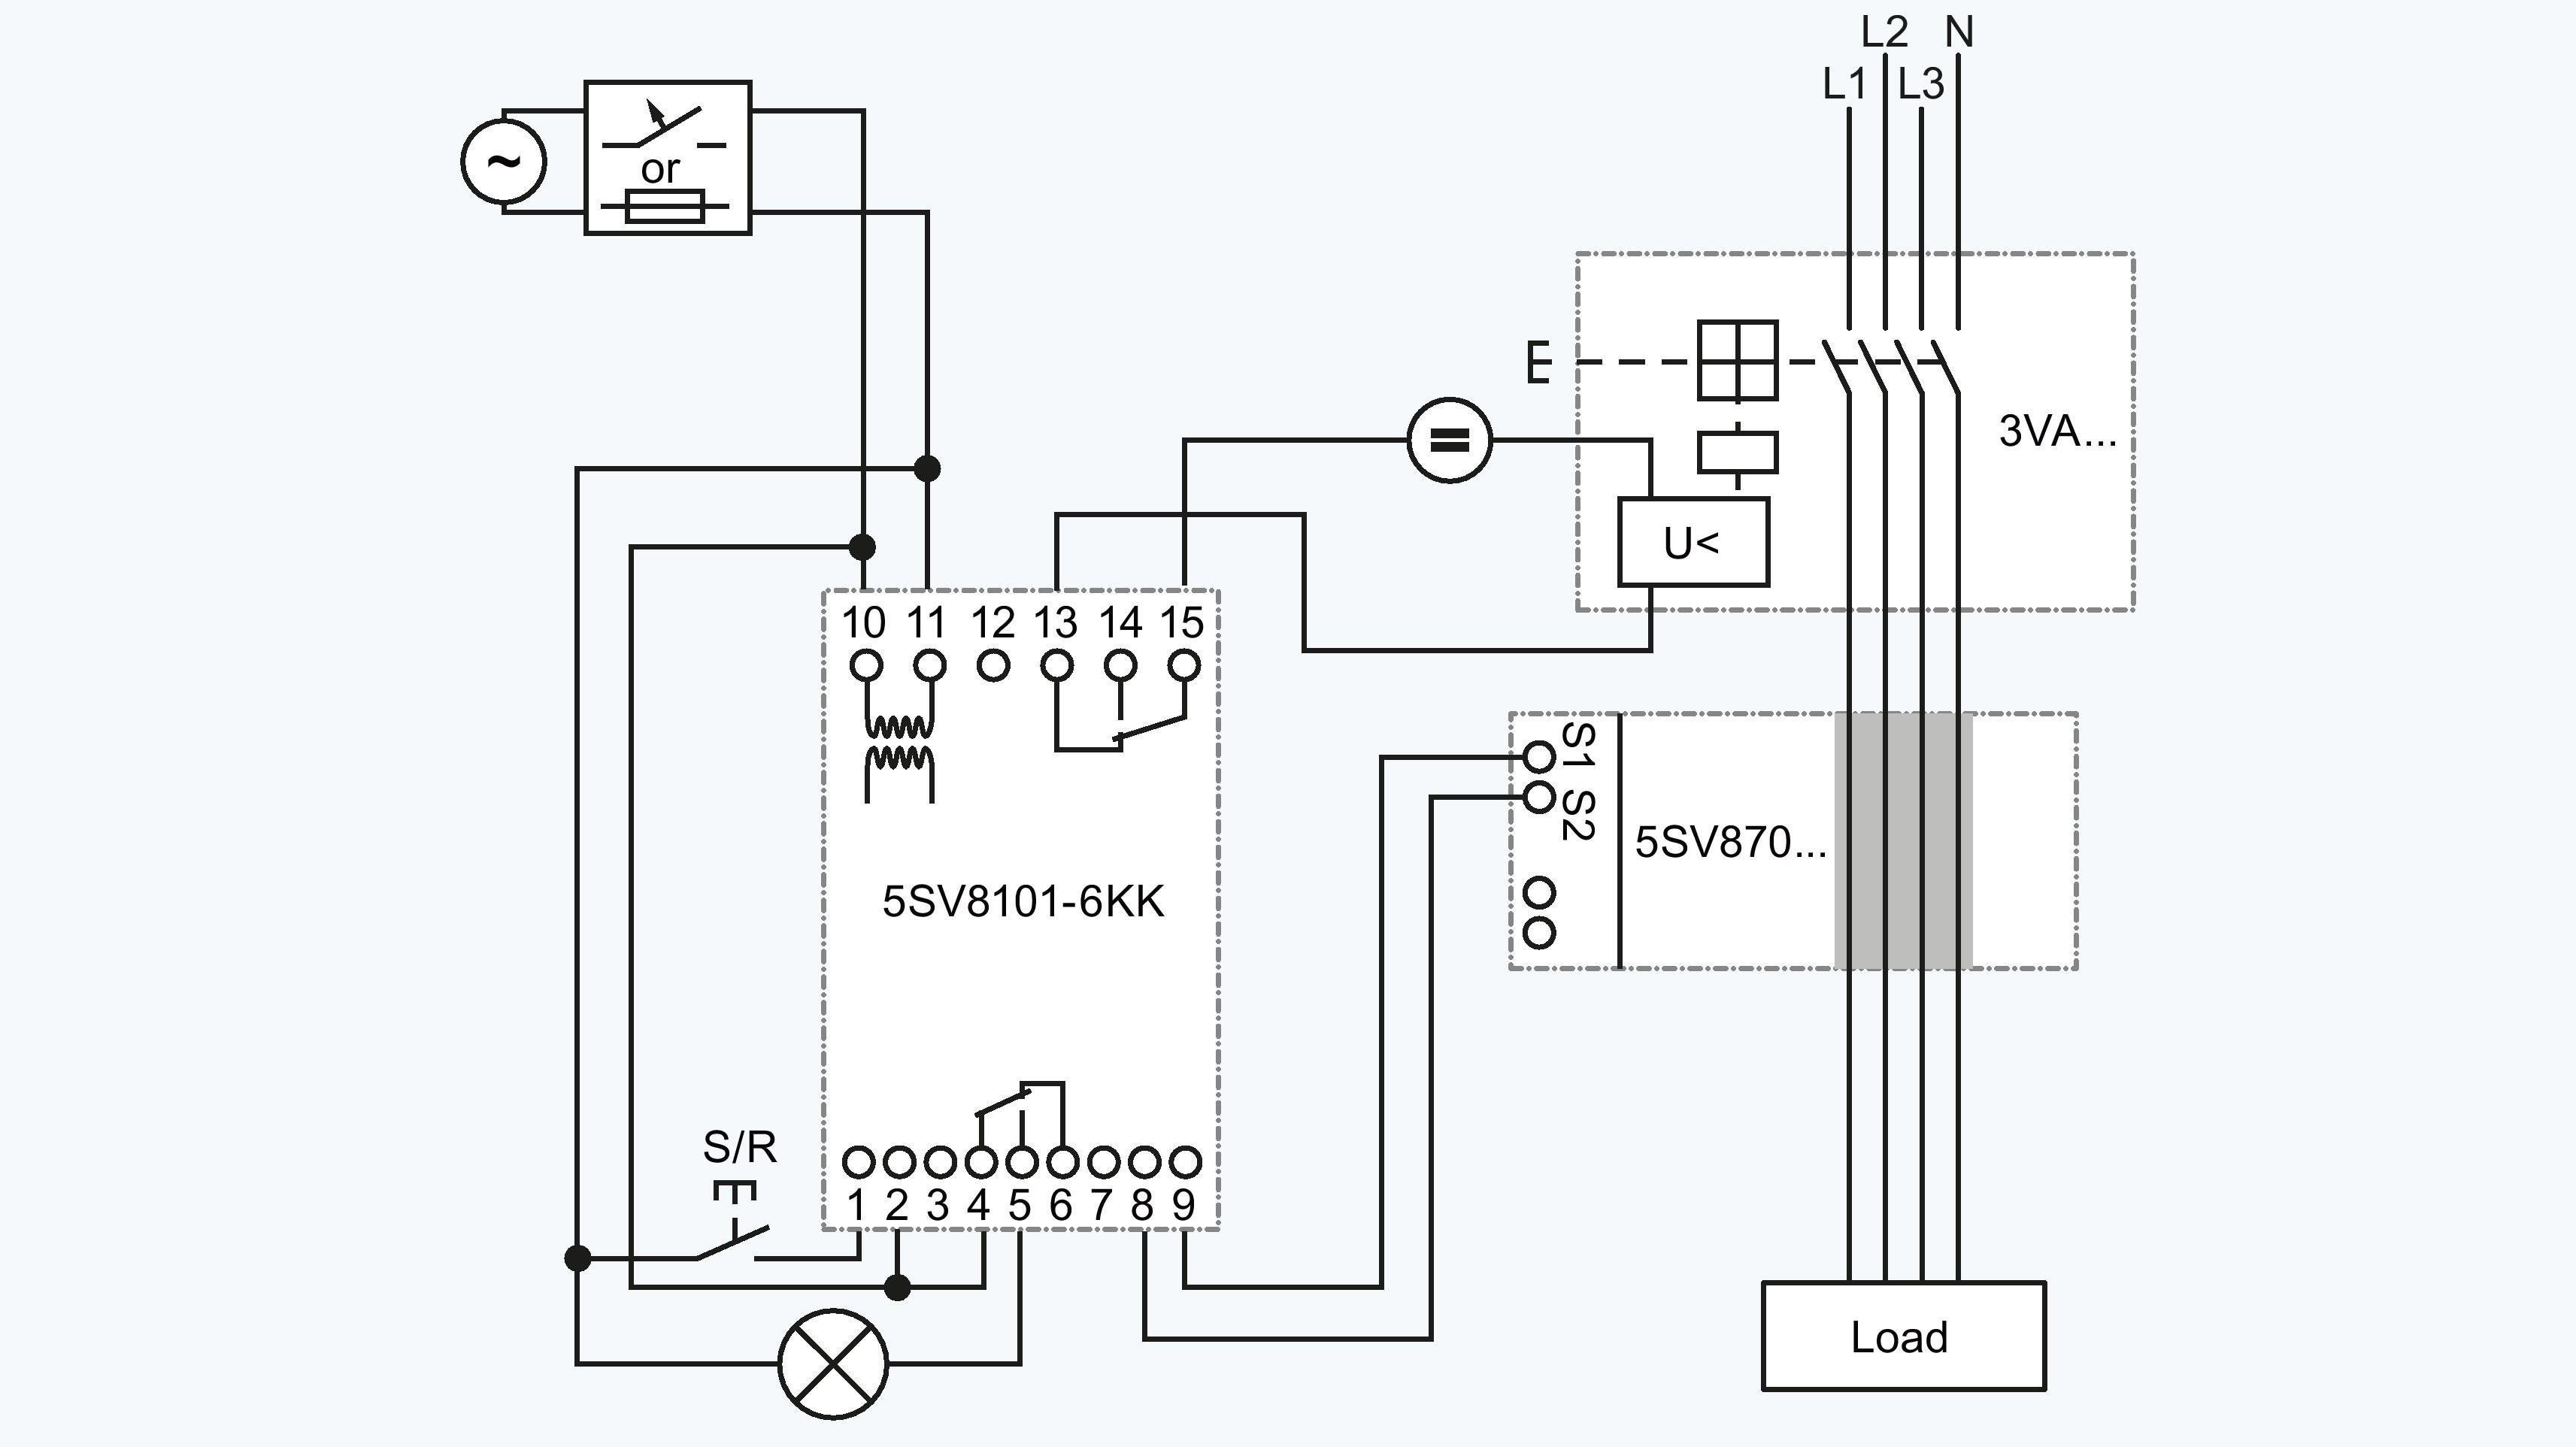 ddec 2 injector wiring diagram modine pdp kitchen hood shunt trip auto electrical siemens breaker